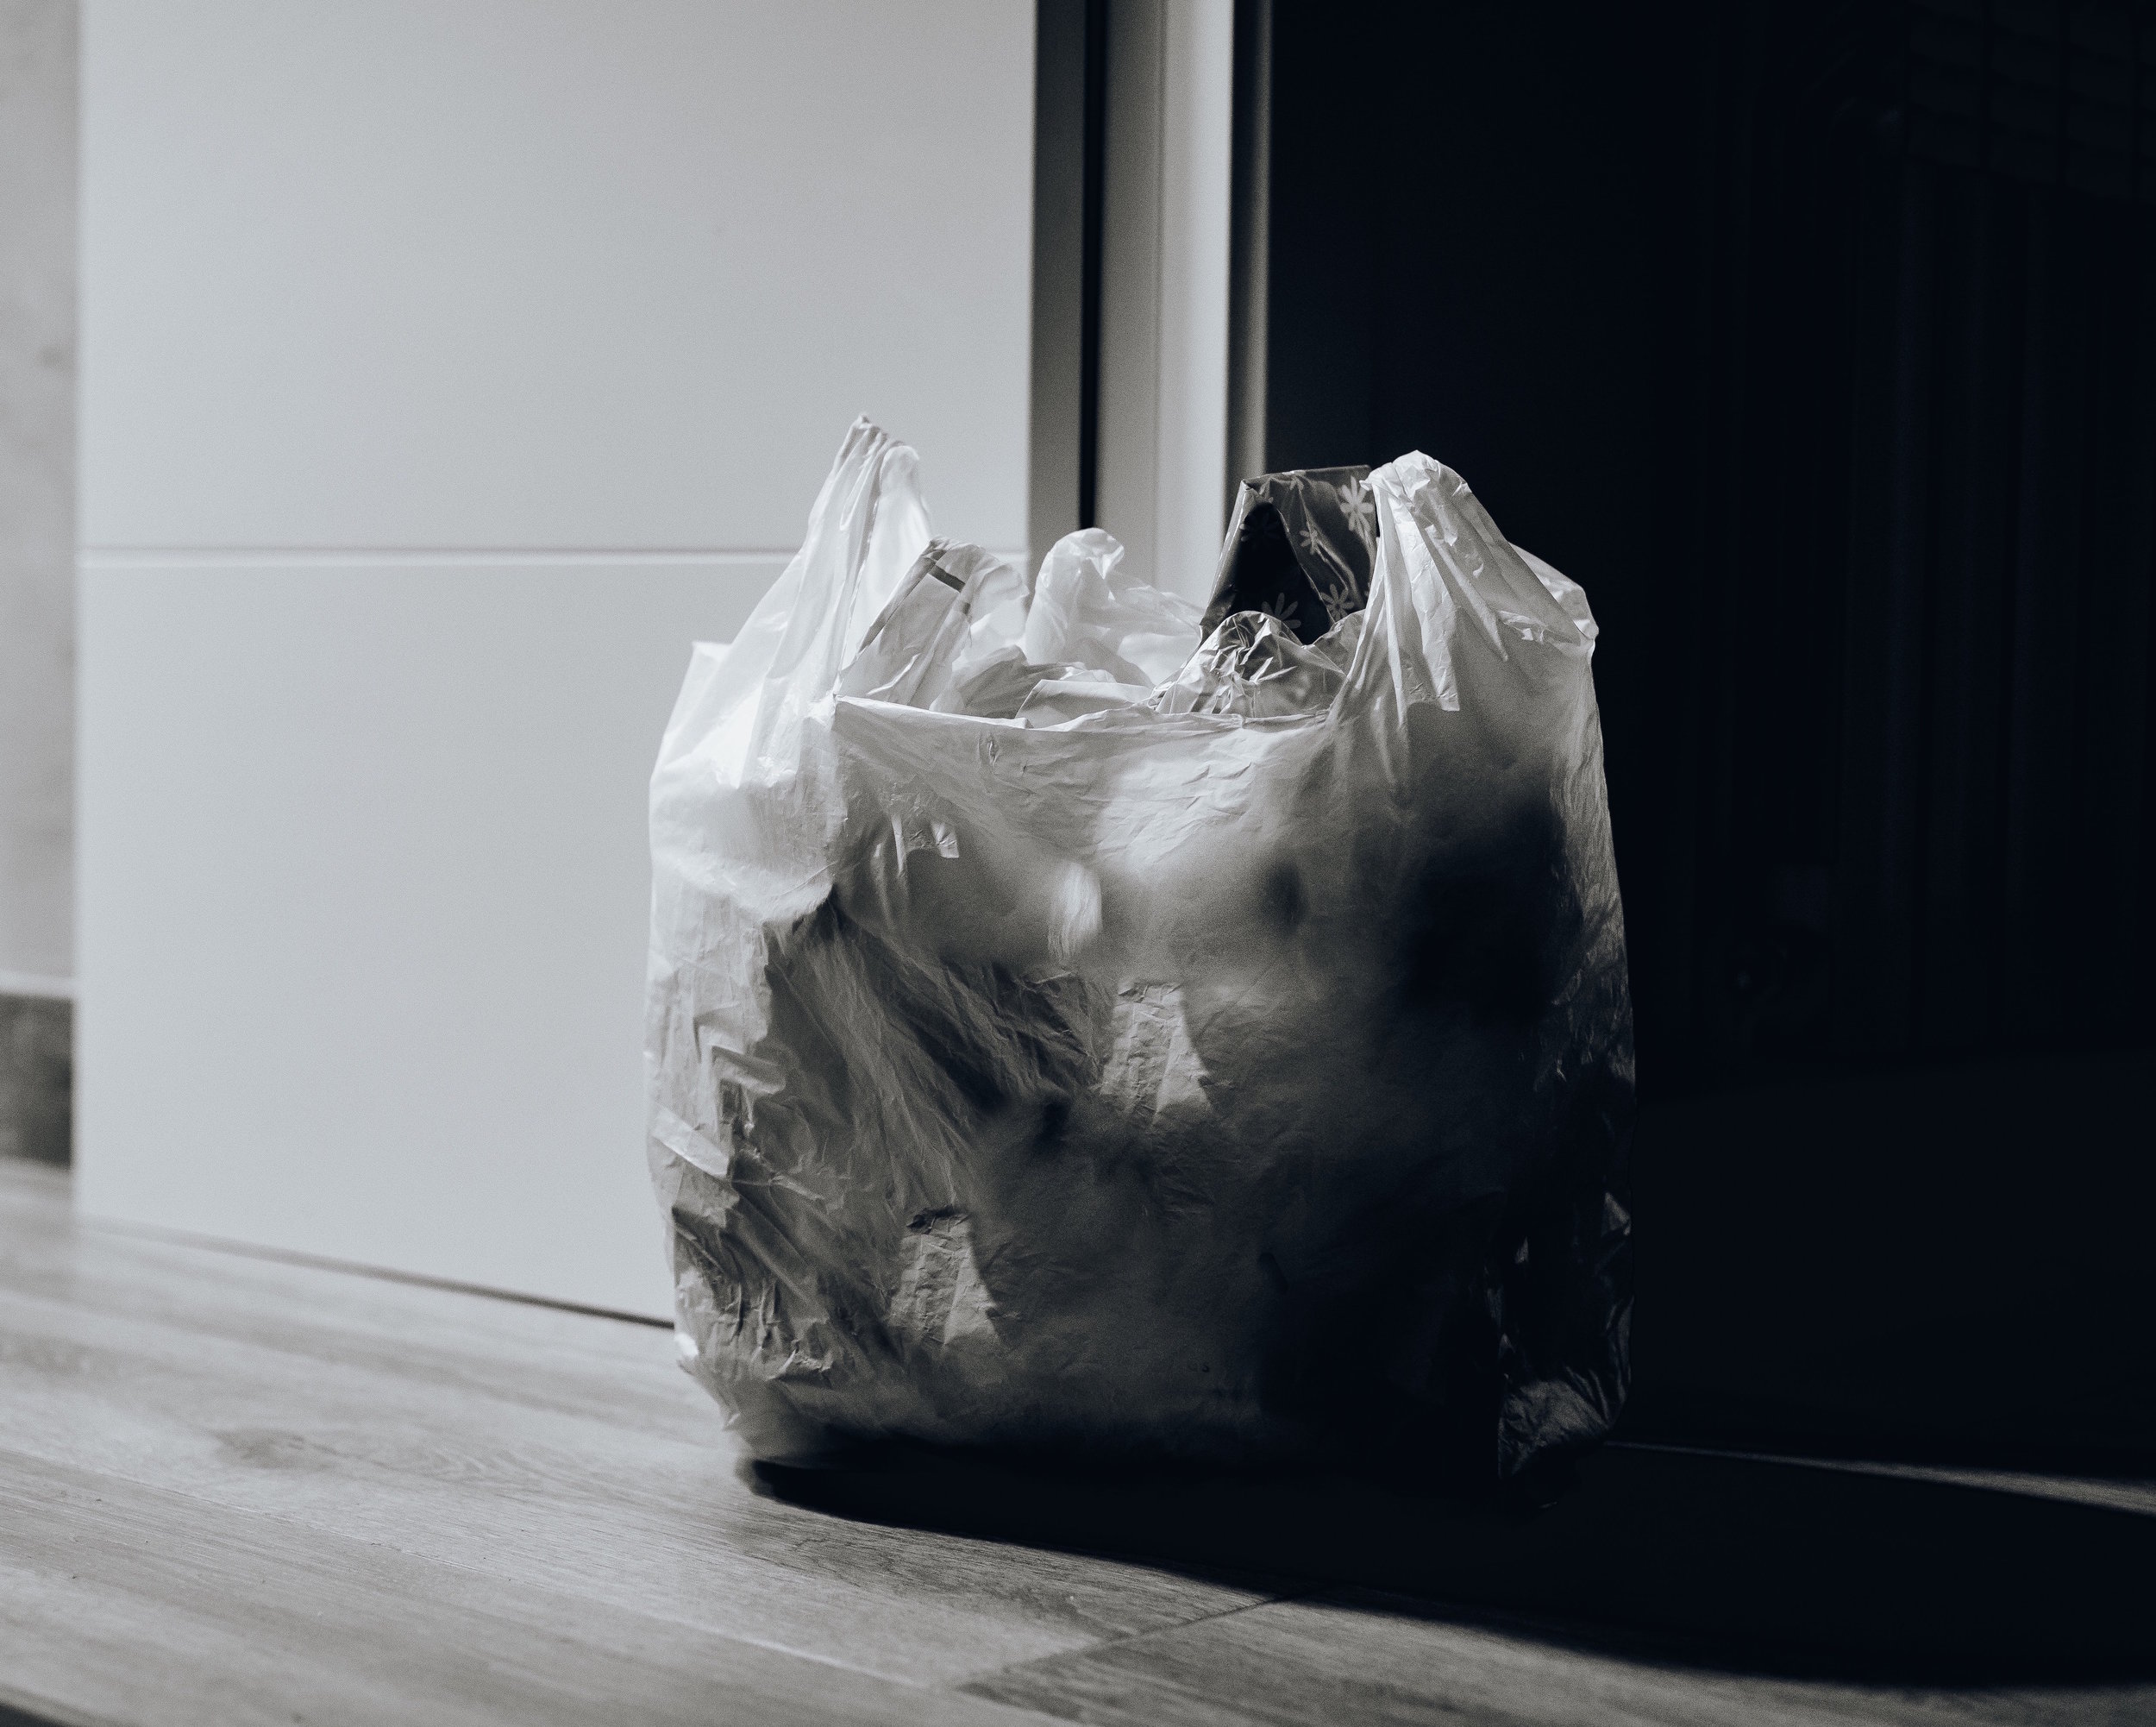 black-and-white-black-and-white-garbage-1549528.jpg